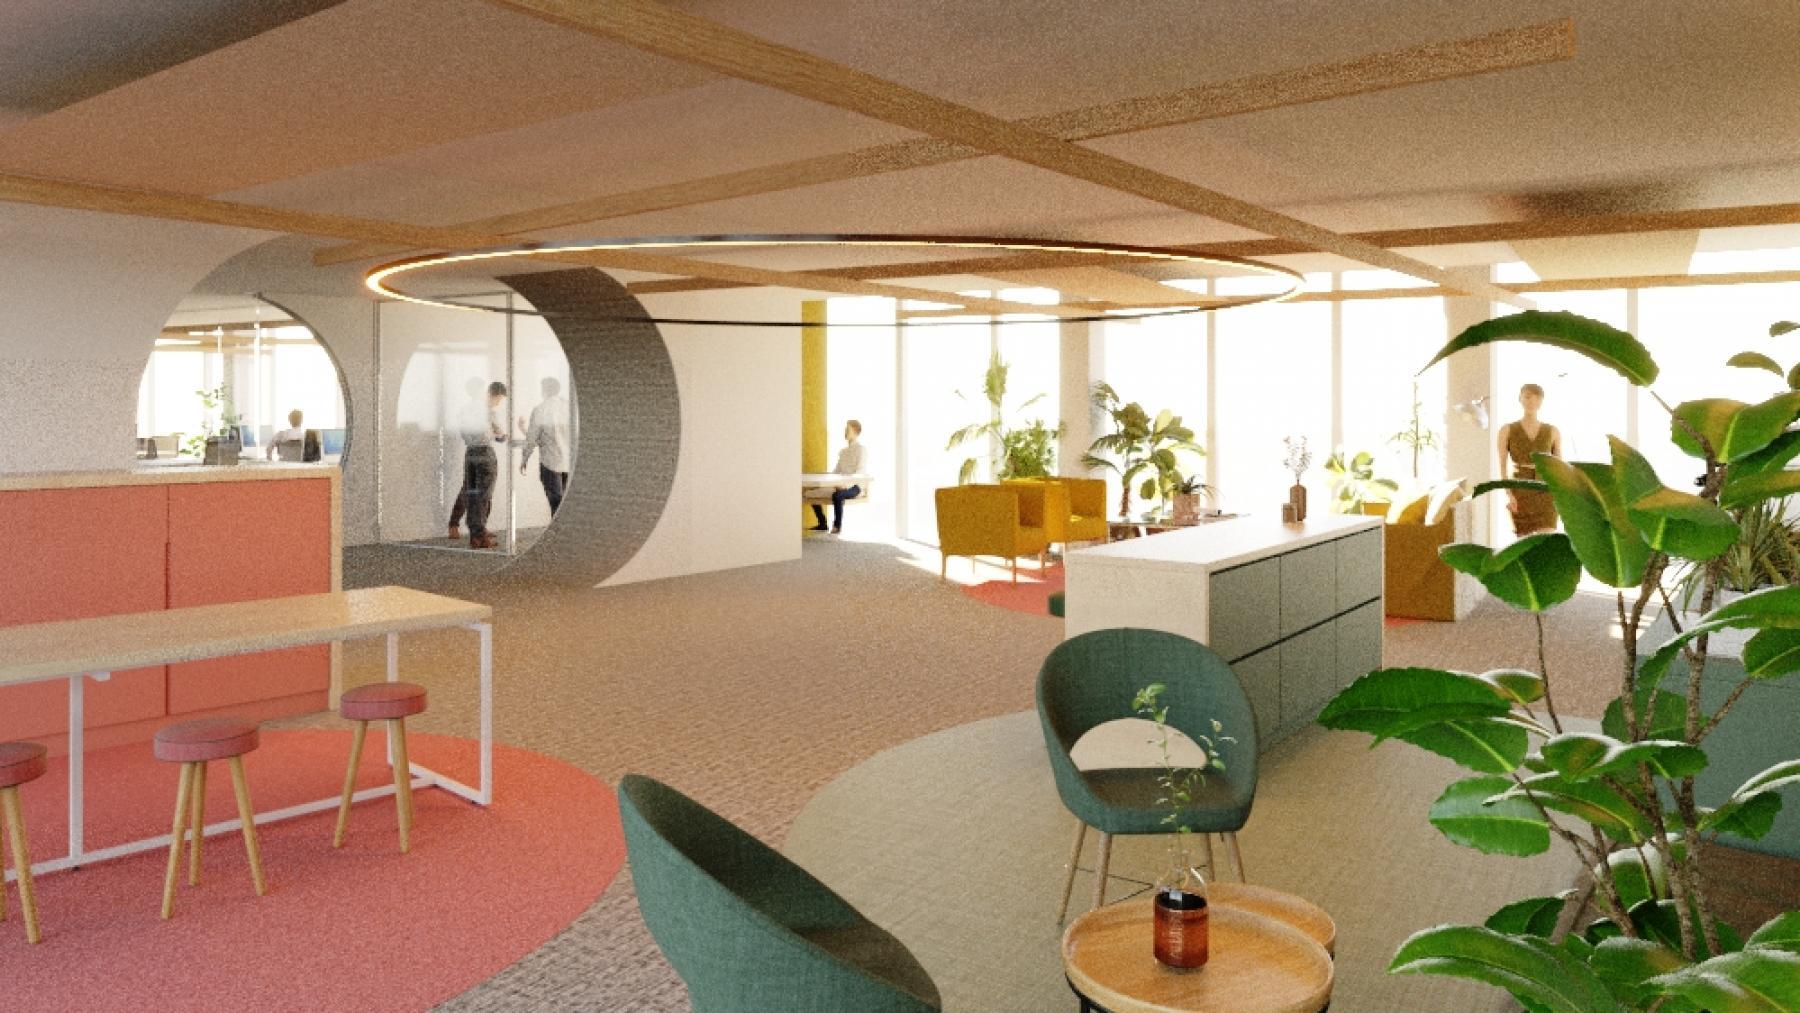 Alquilar oficinas Carrer dels Pinzón 12, Barcelona (2)